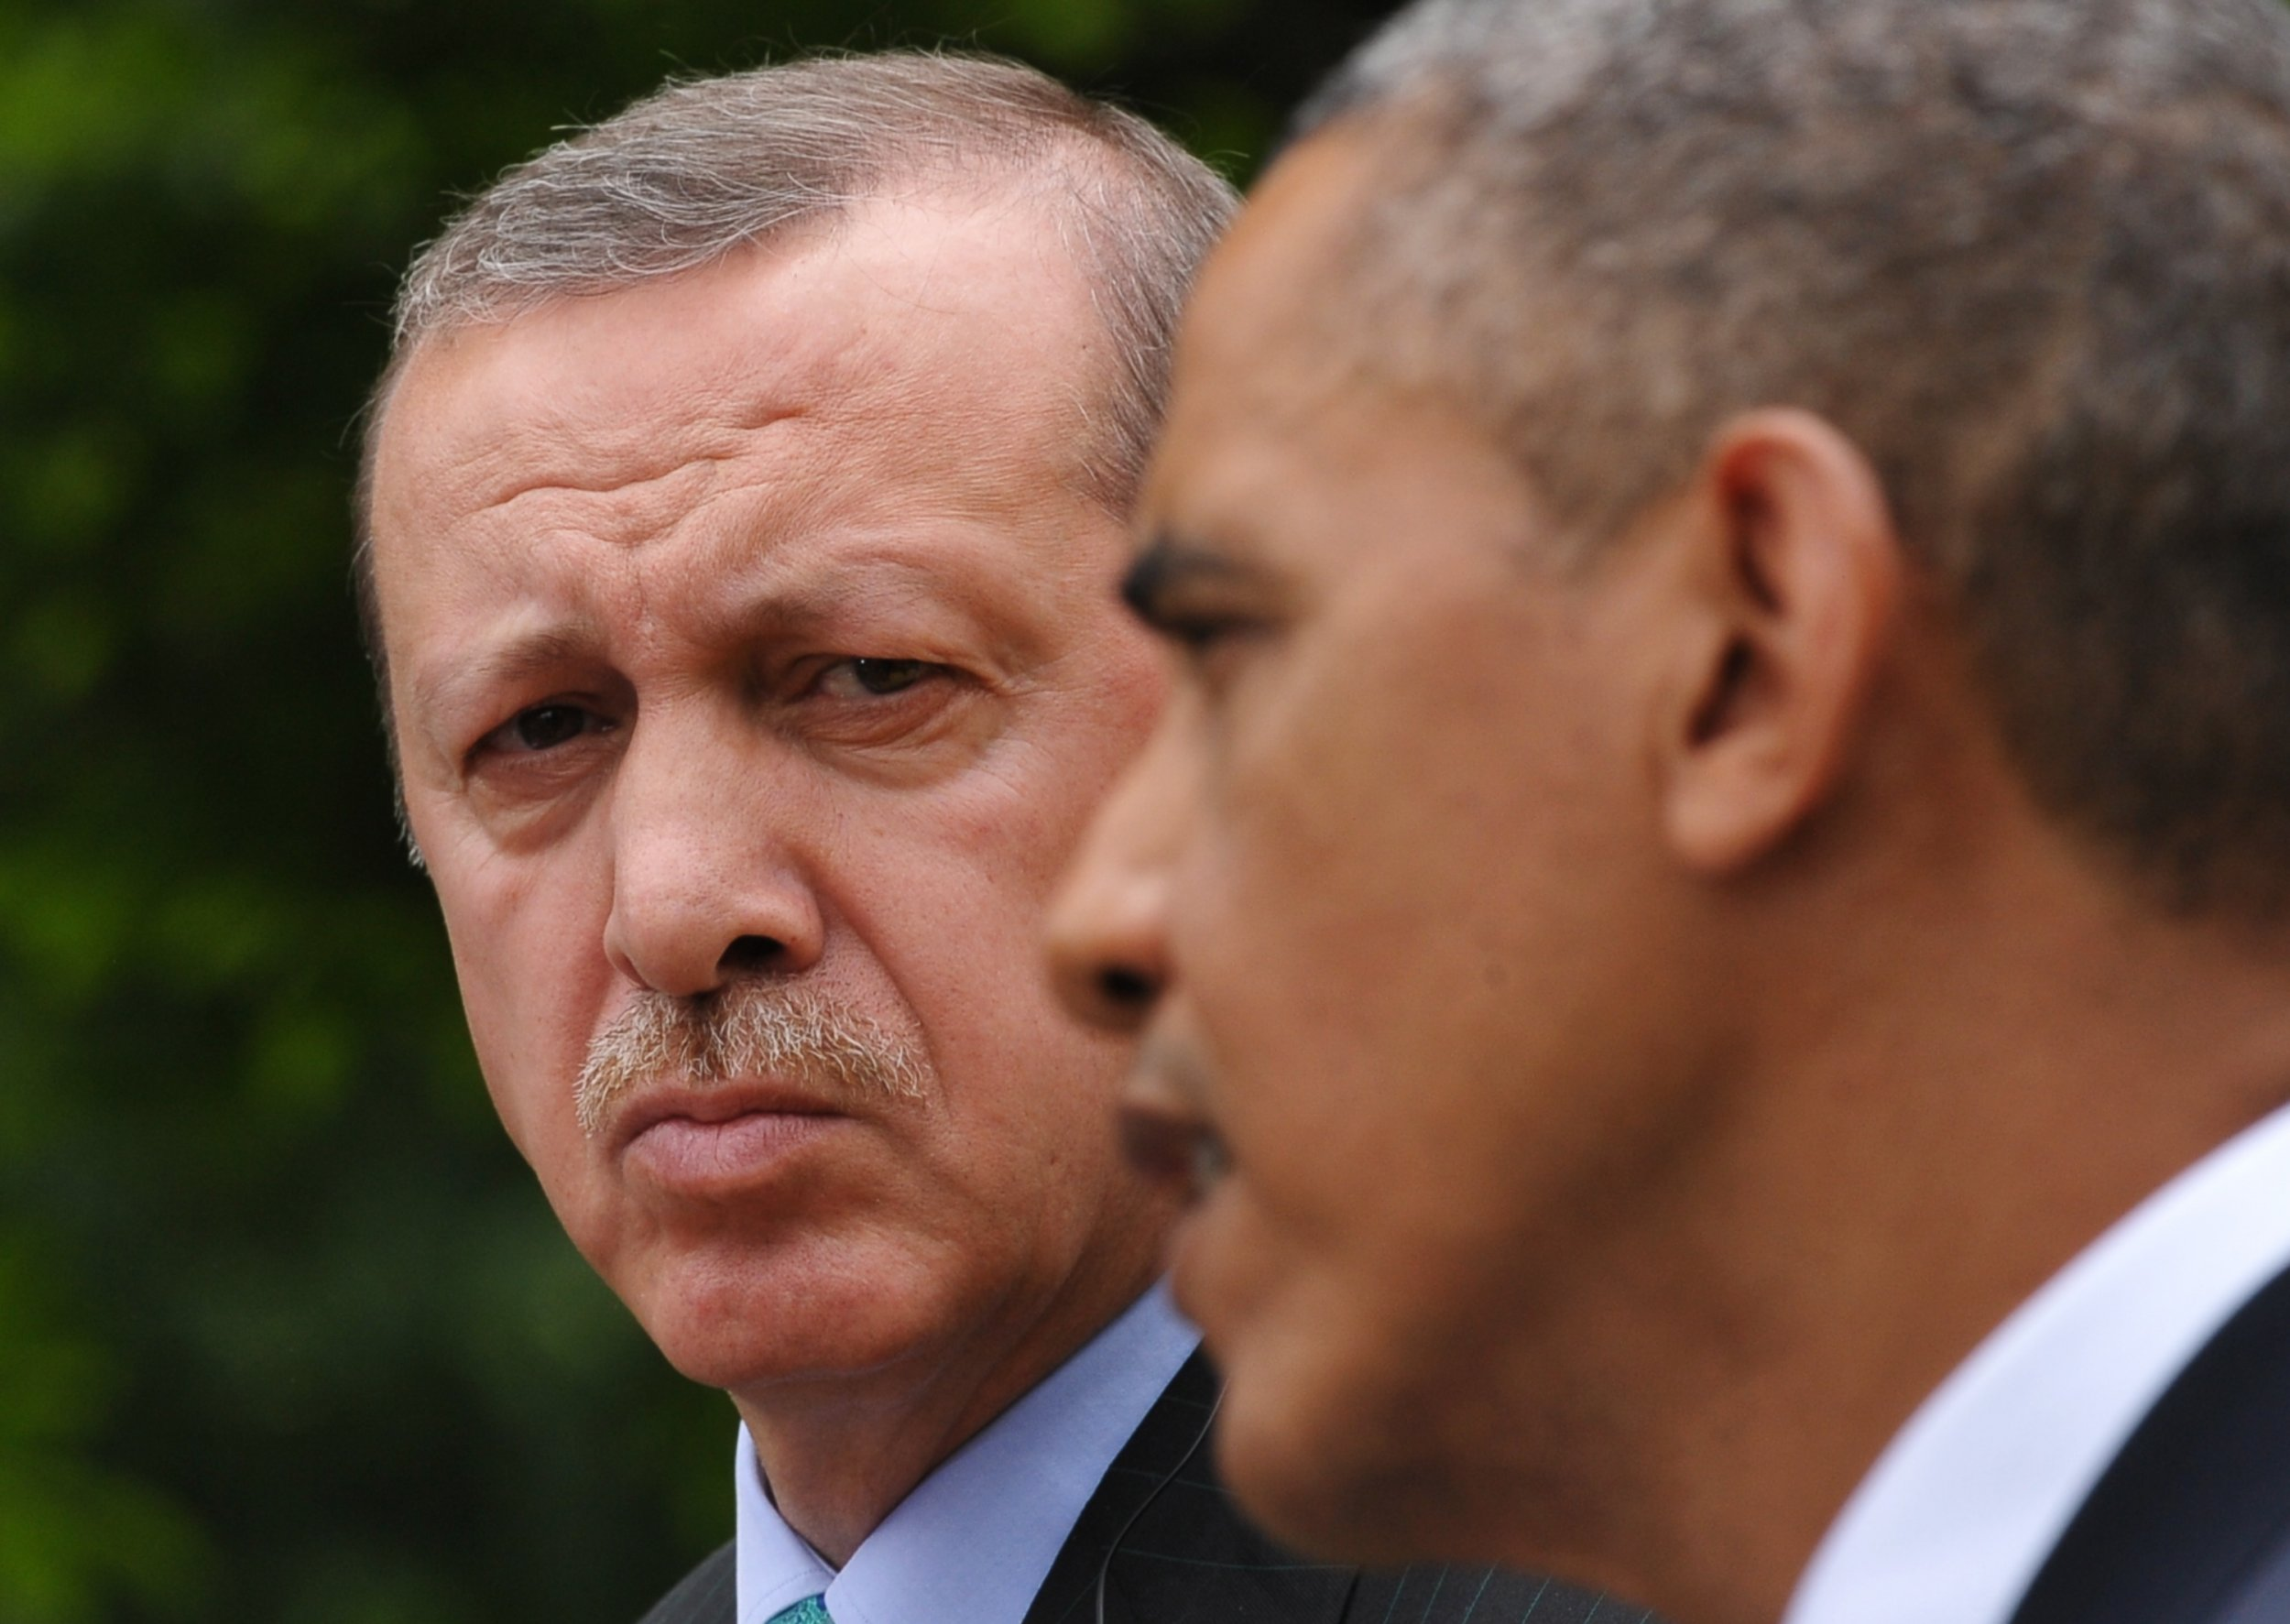 Recep Tayyip Erodgan and Barack Obama